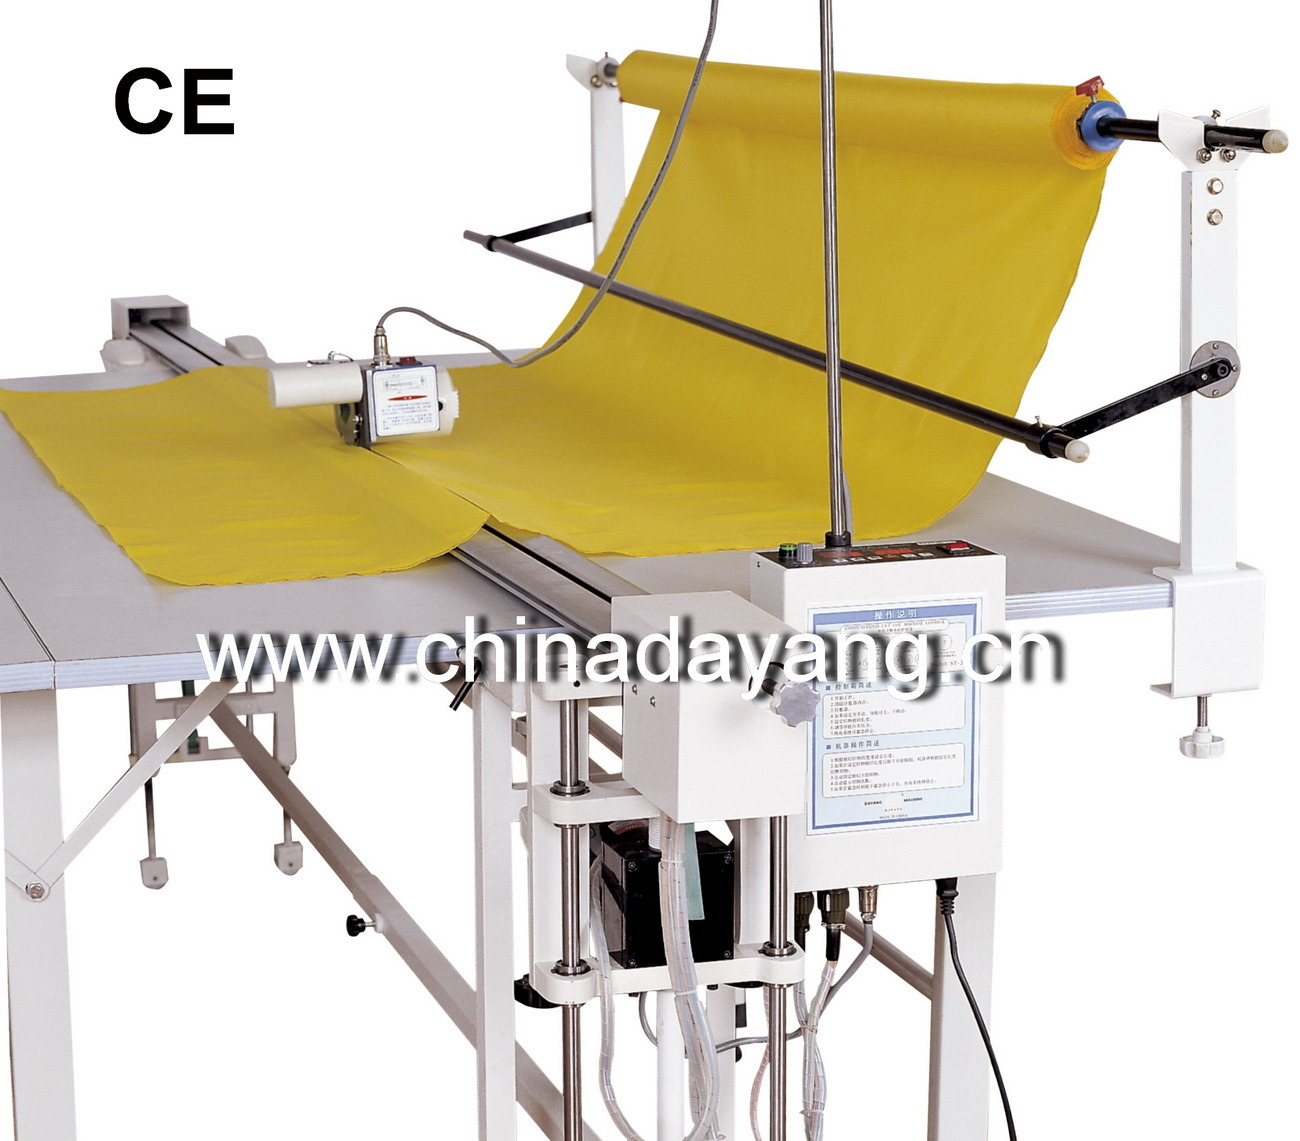 Ce Automatic End Cutter Guide Track Cutting Machine (DYDB-3)